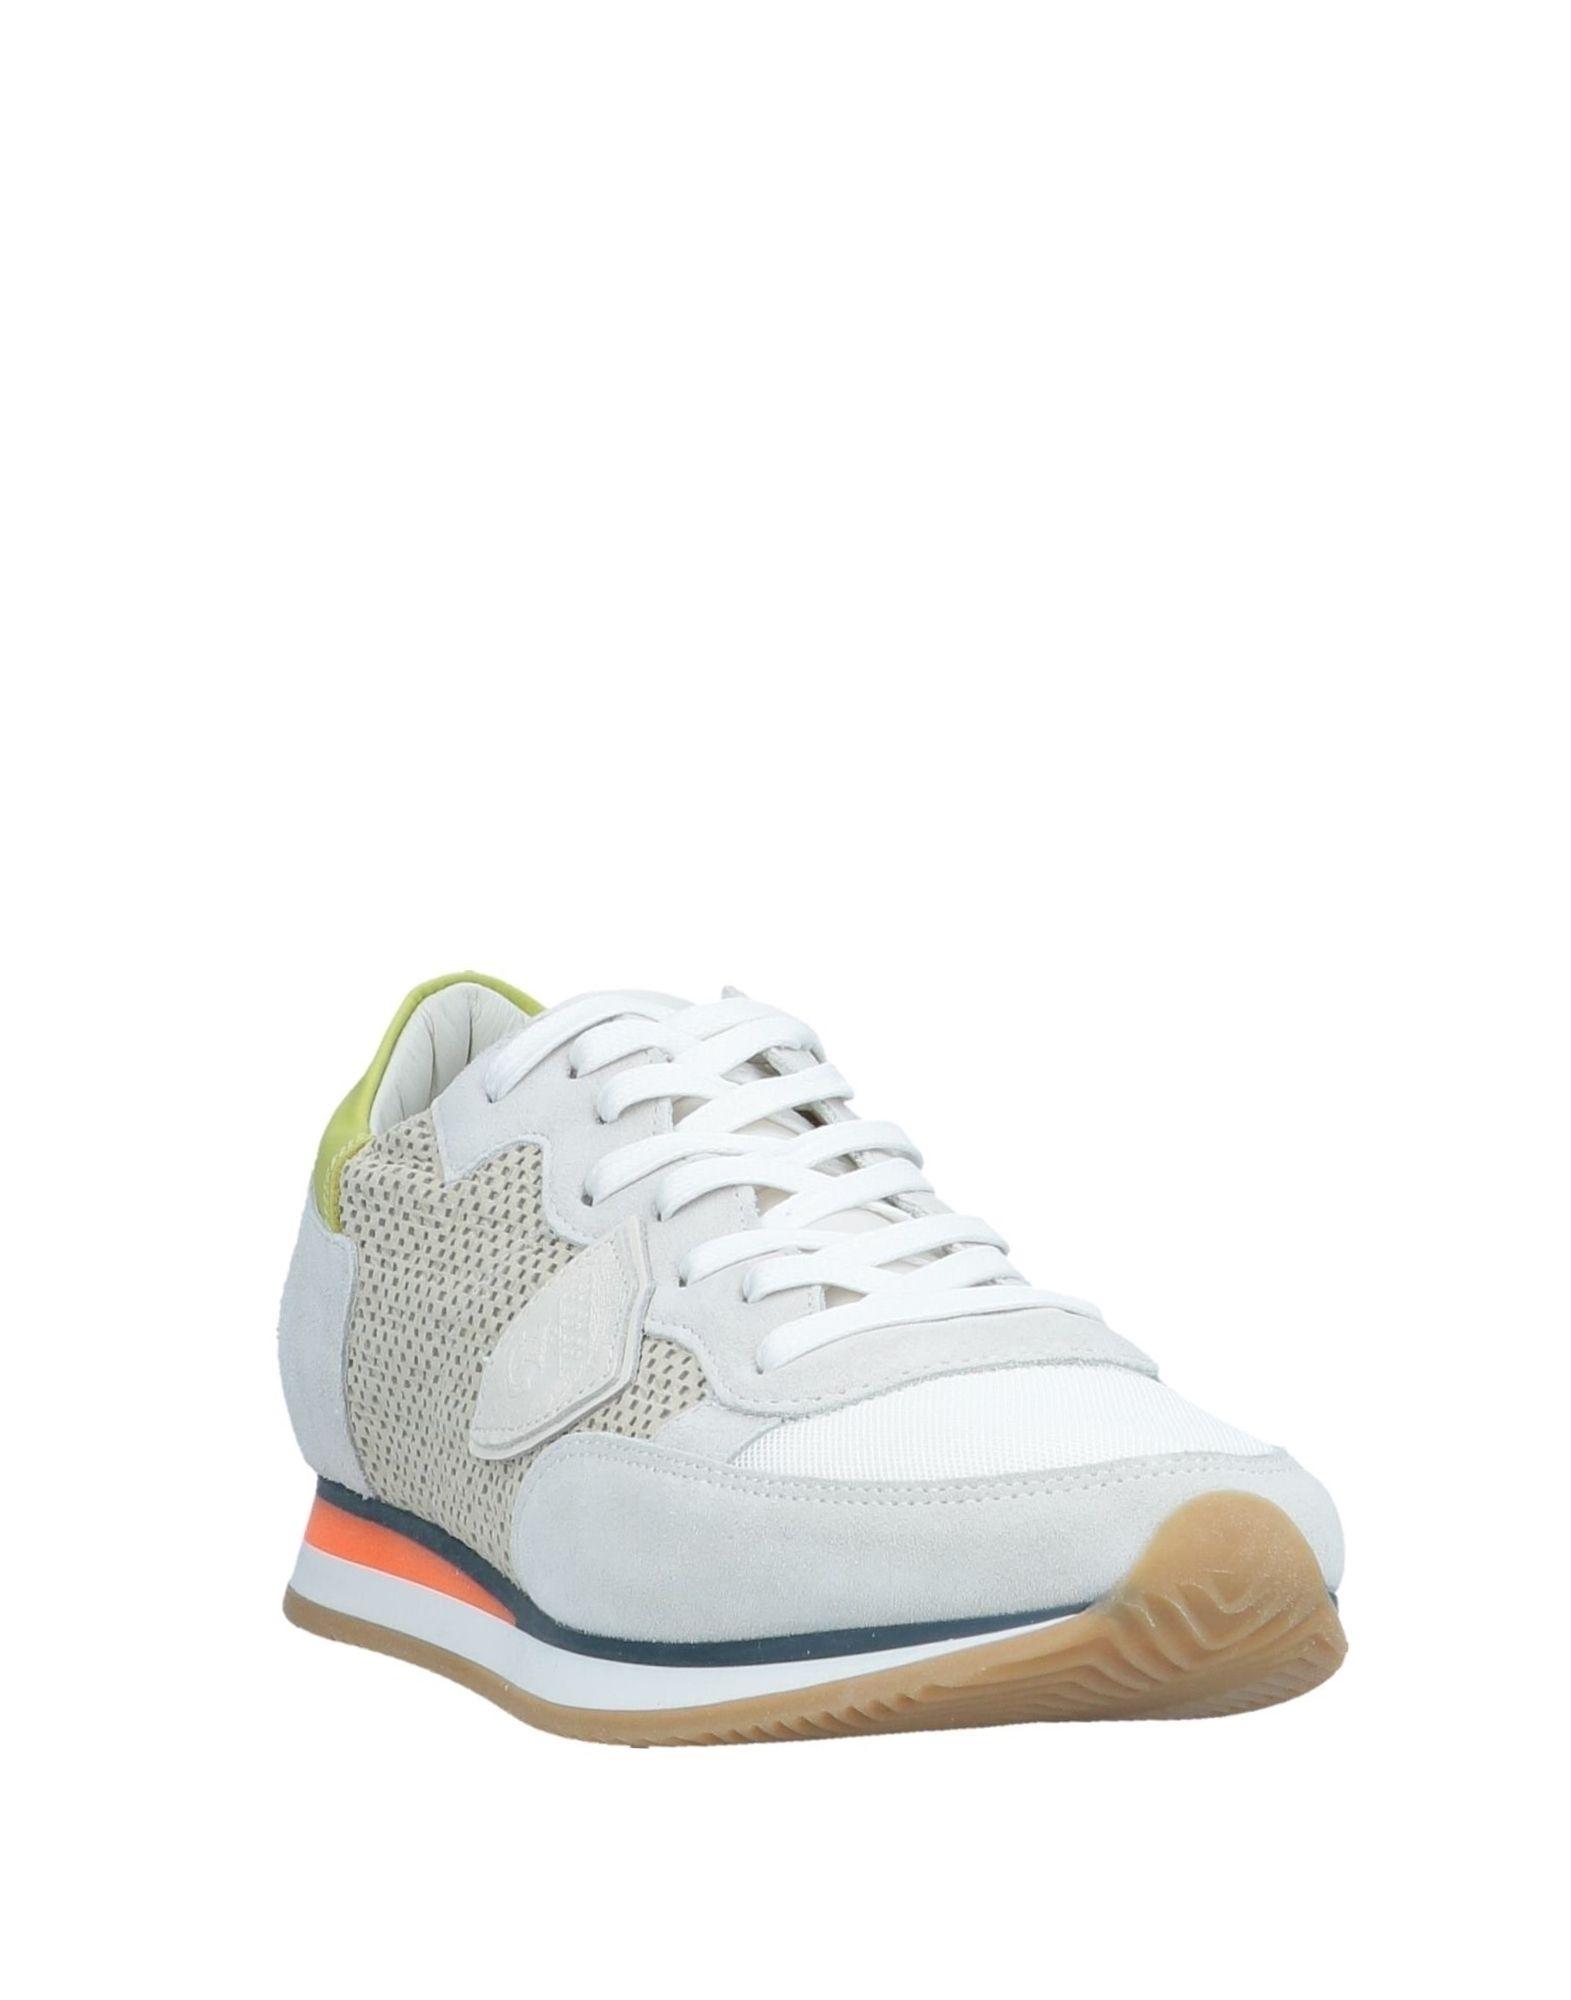 Philippe Model Sneakers Herren Gutes Preis-Leistungs-Verhältnis, sich es lohnt sich Preis-Leistungs-Verhältnis, 12ca75